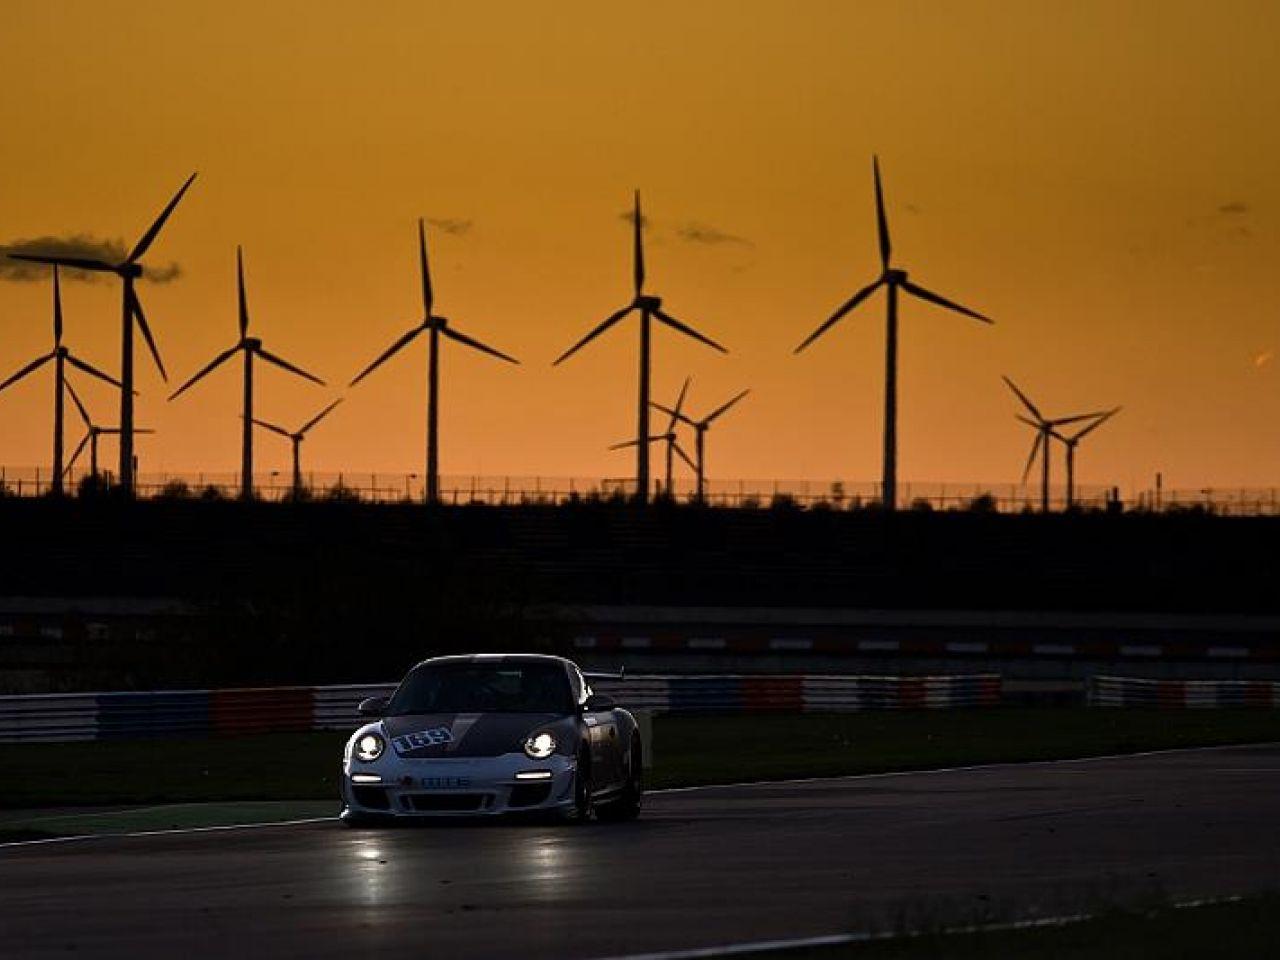 Porsche 997 GT3 RS Lausitzring Abenddämmerung